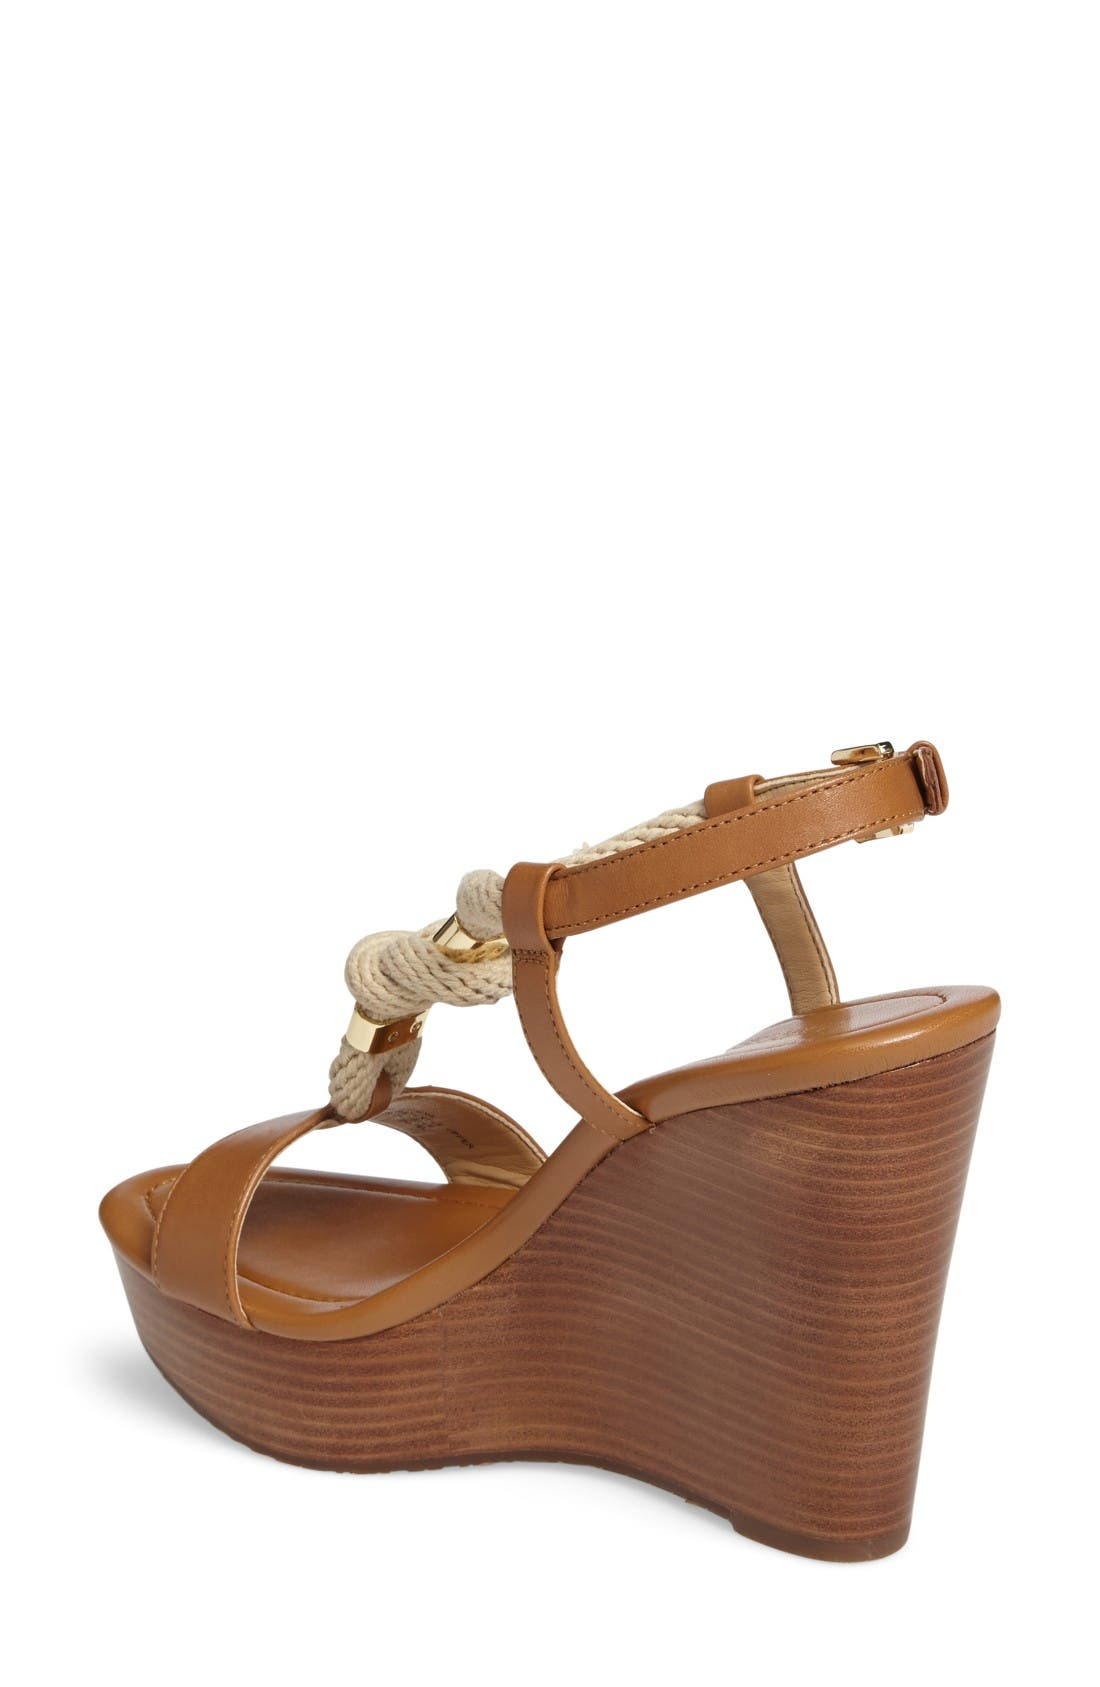 Alternate Image 2  - MICHAEL Michael Kors 'Holly' Espadrille Wedge Sandal (Women)